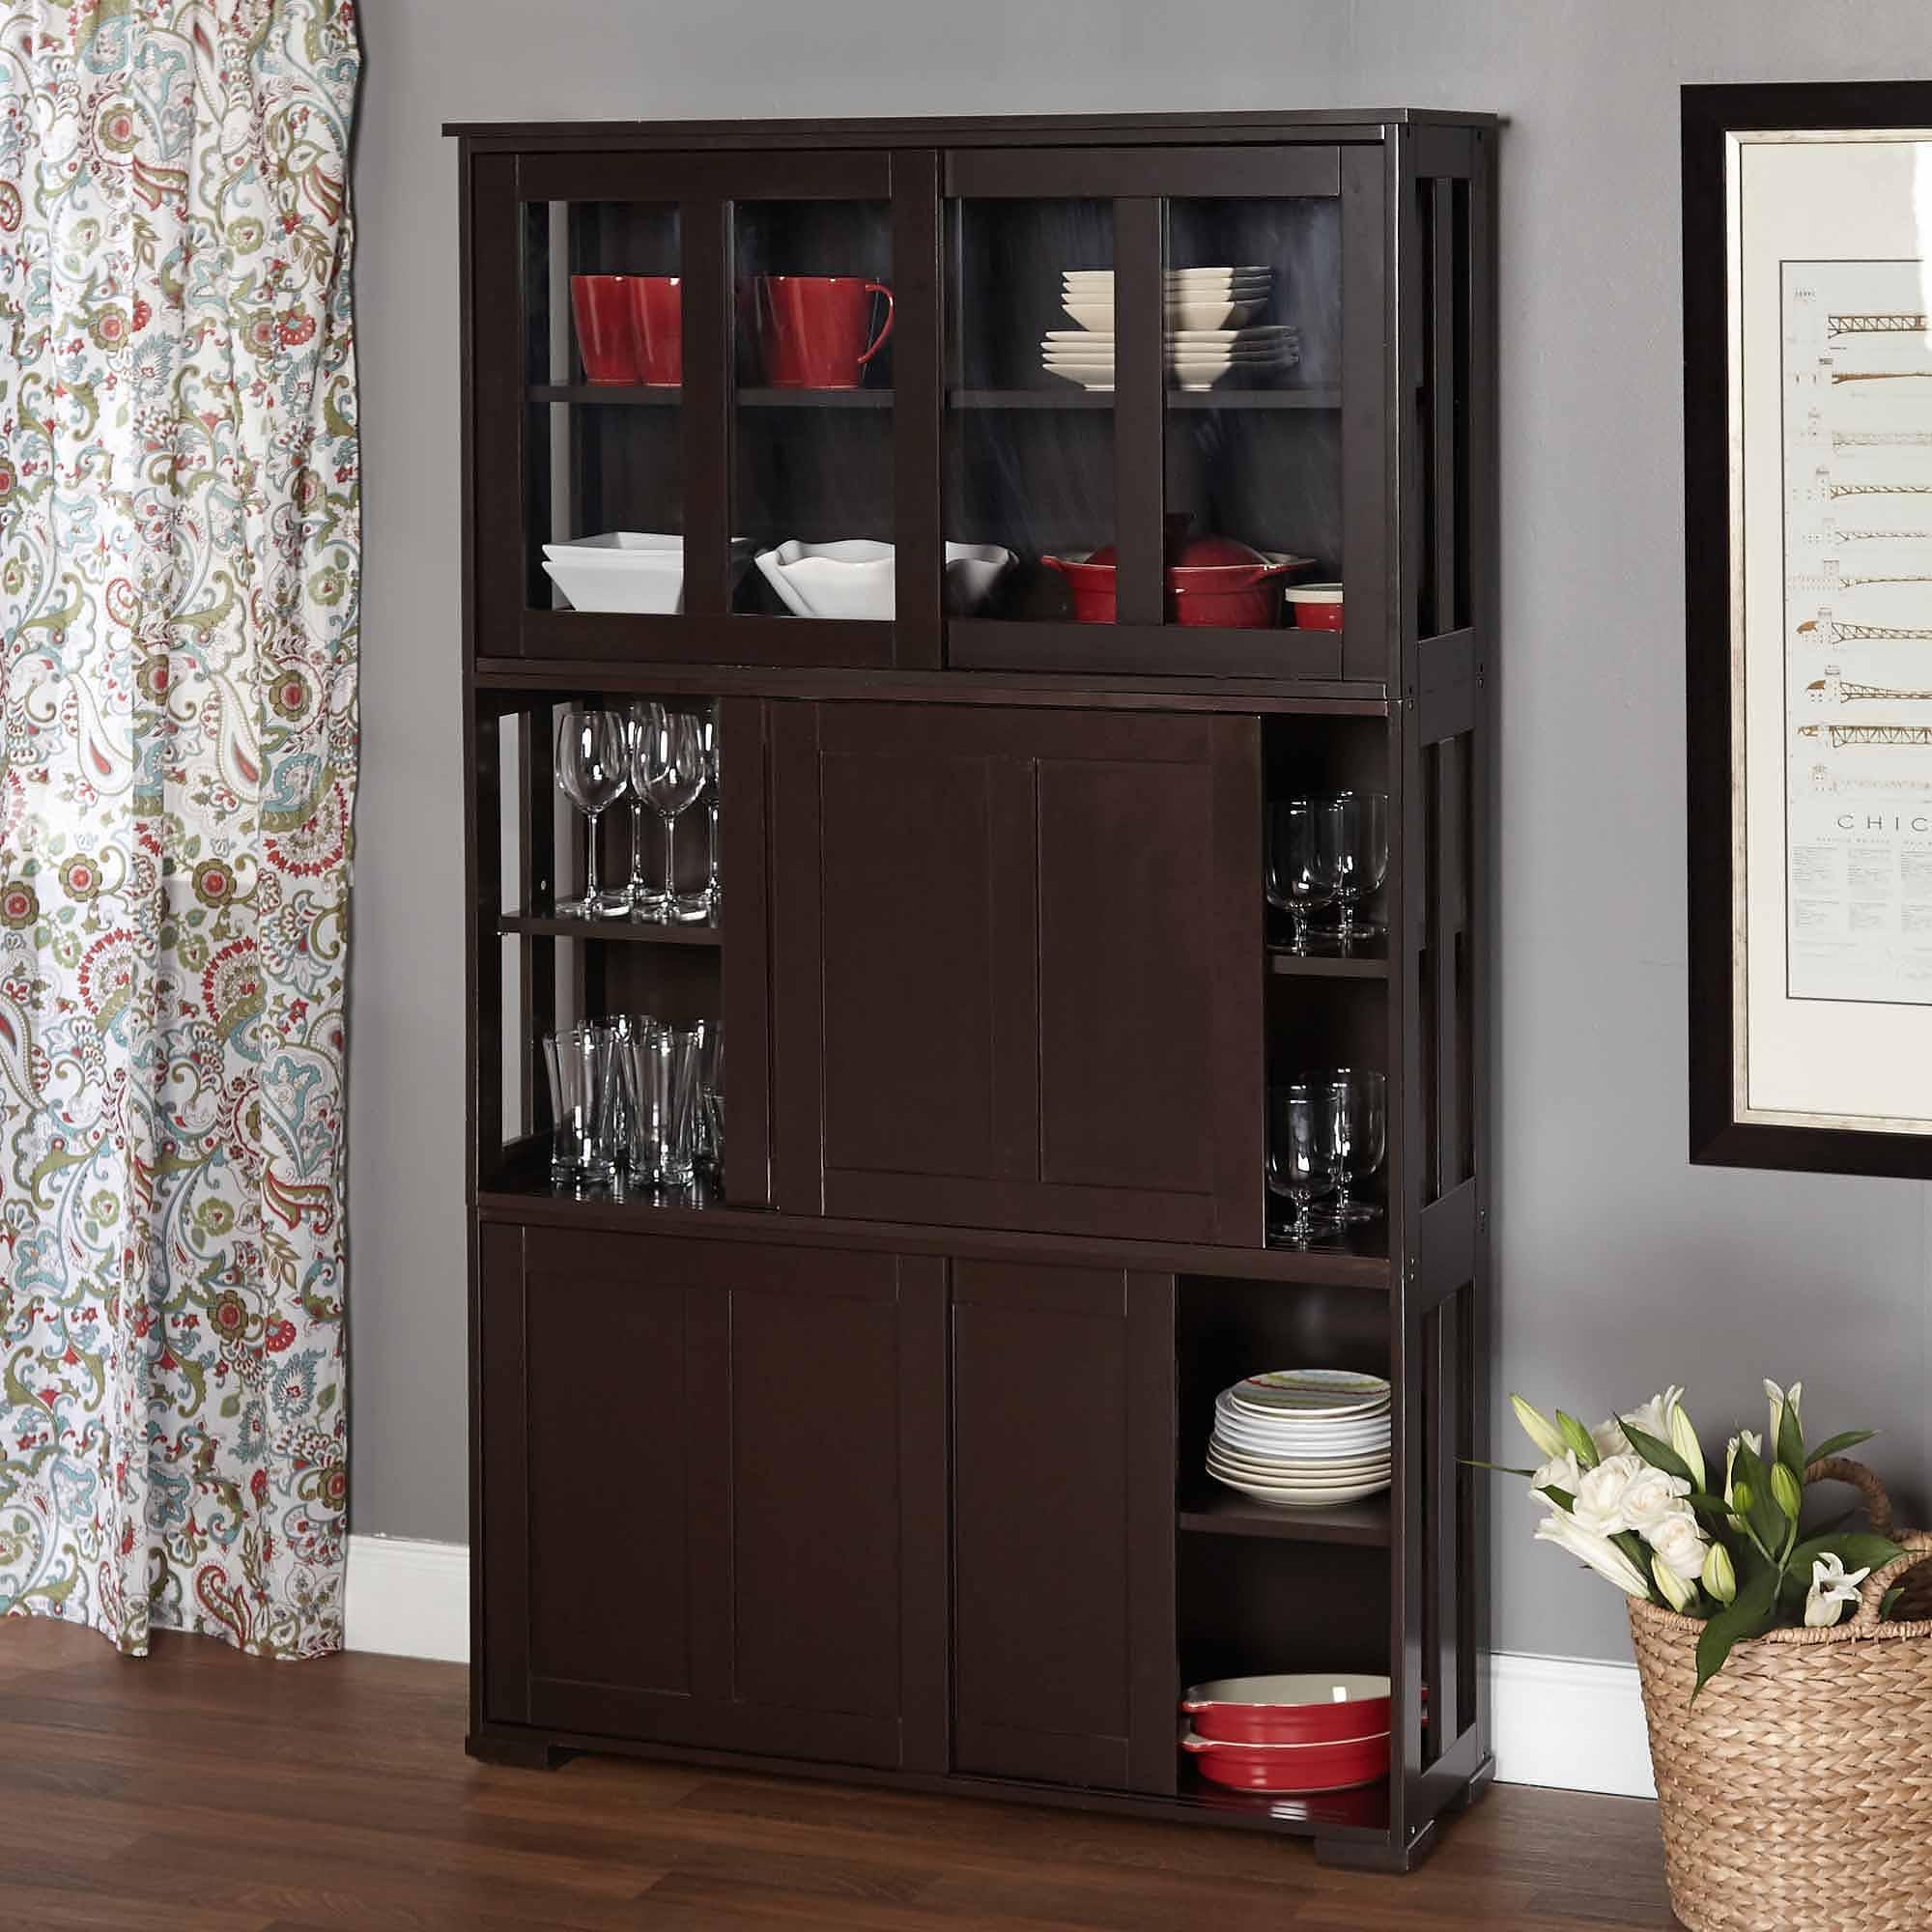 http://lankaweb.biz/wp-content/uploads/2018/04/first-rate-corner-dining-room-cabinet-20.jpg